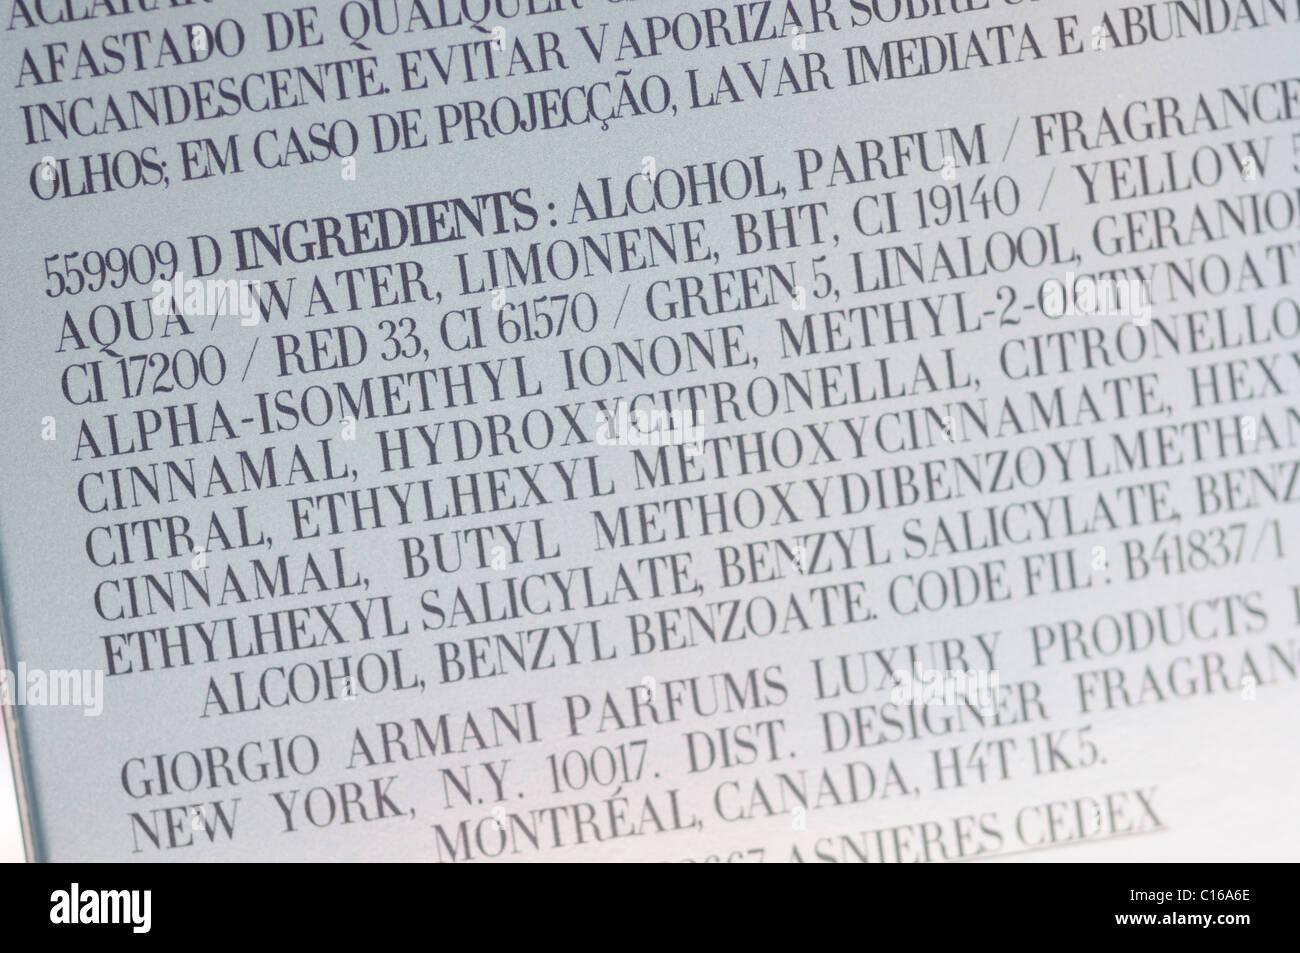 Ingredient list on perfume package - Stock Image